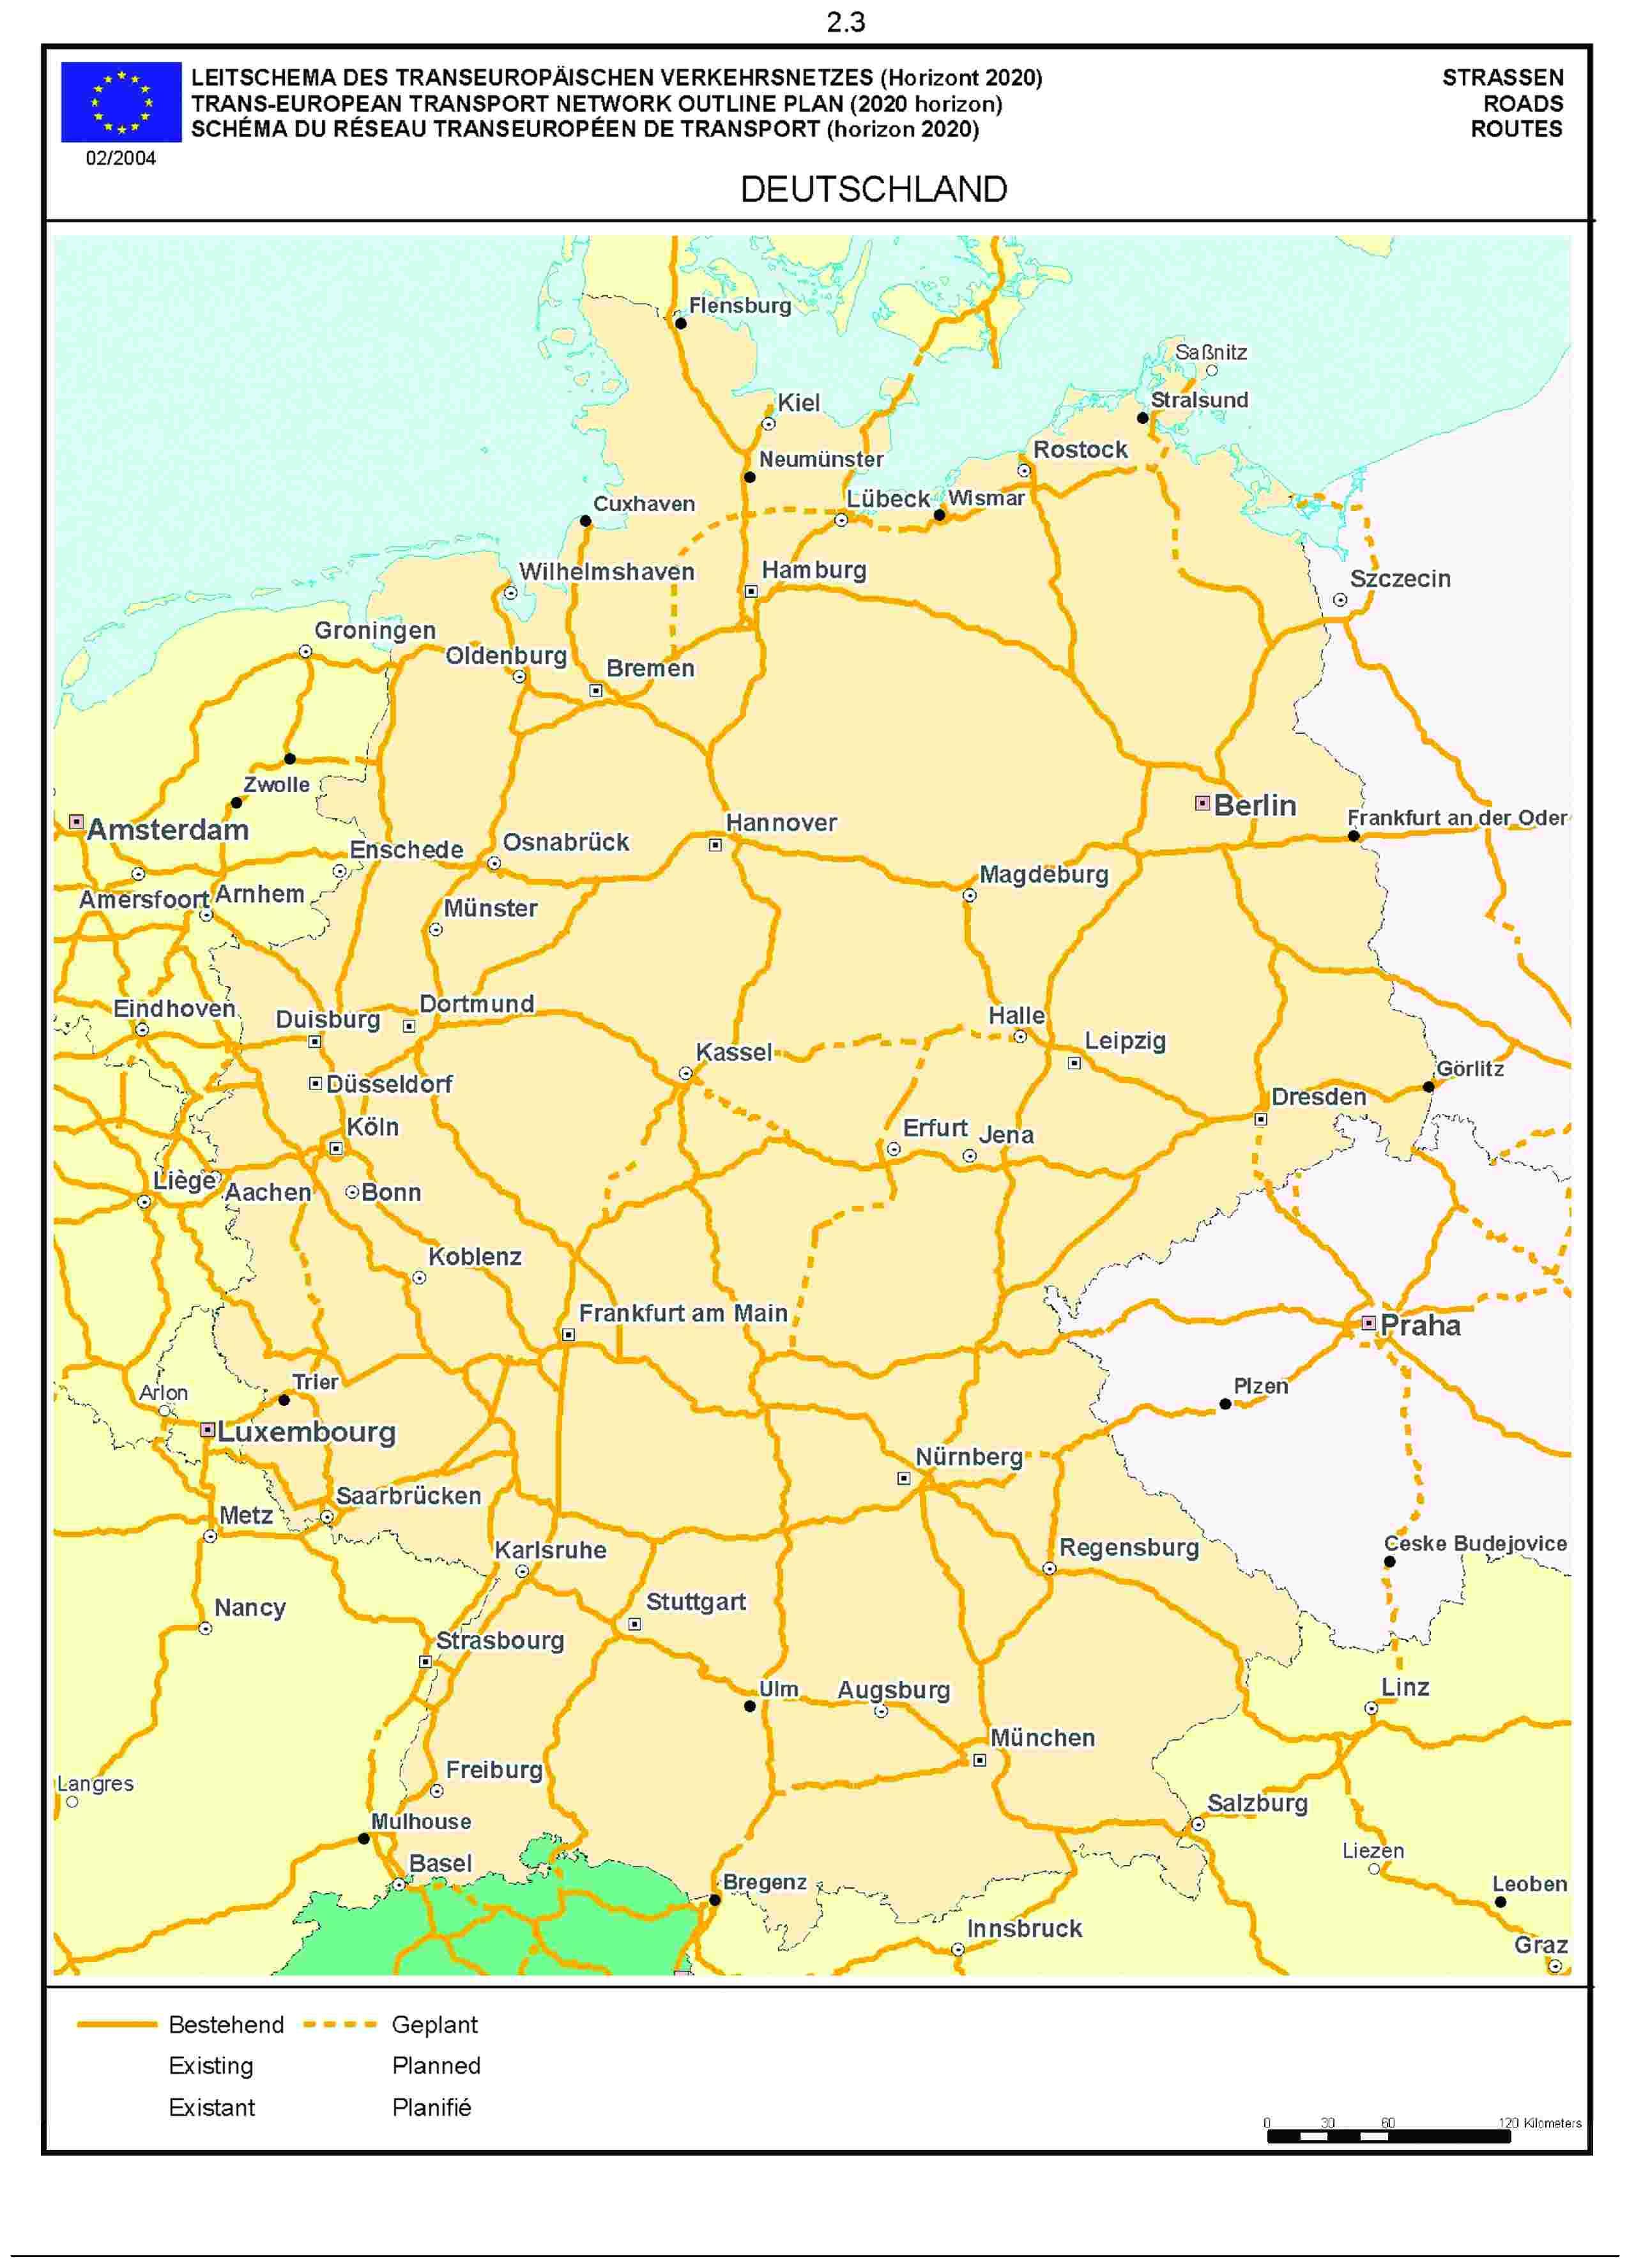 2.3LEITSCHEMA DES TRANSEUROPÄISCHEN VERKEHRSNETZES (Horizont 2020) STRASSENTRANS-EUROPEAN TRANSPORT NETWORK OUTLINE PLAN (2020 horizon) ROADSSCHÉMA DU RÉSEAU TRANSEUROPÉEN DE TRANSPORT (horizon 2020) ROUTE02/2004DEUTSCHLAND